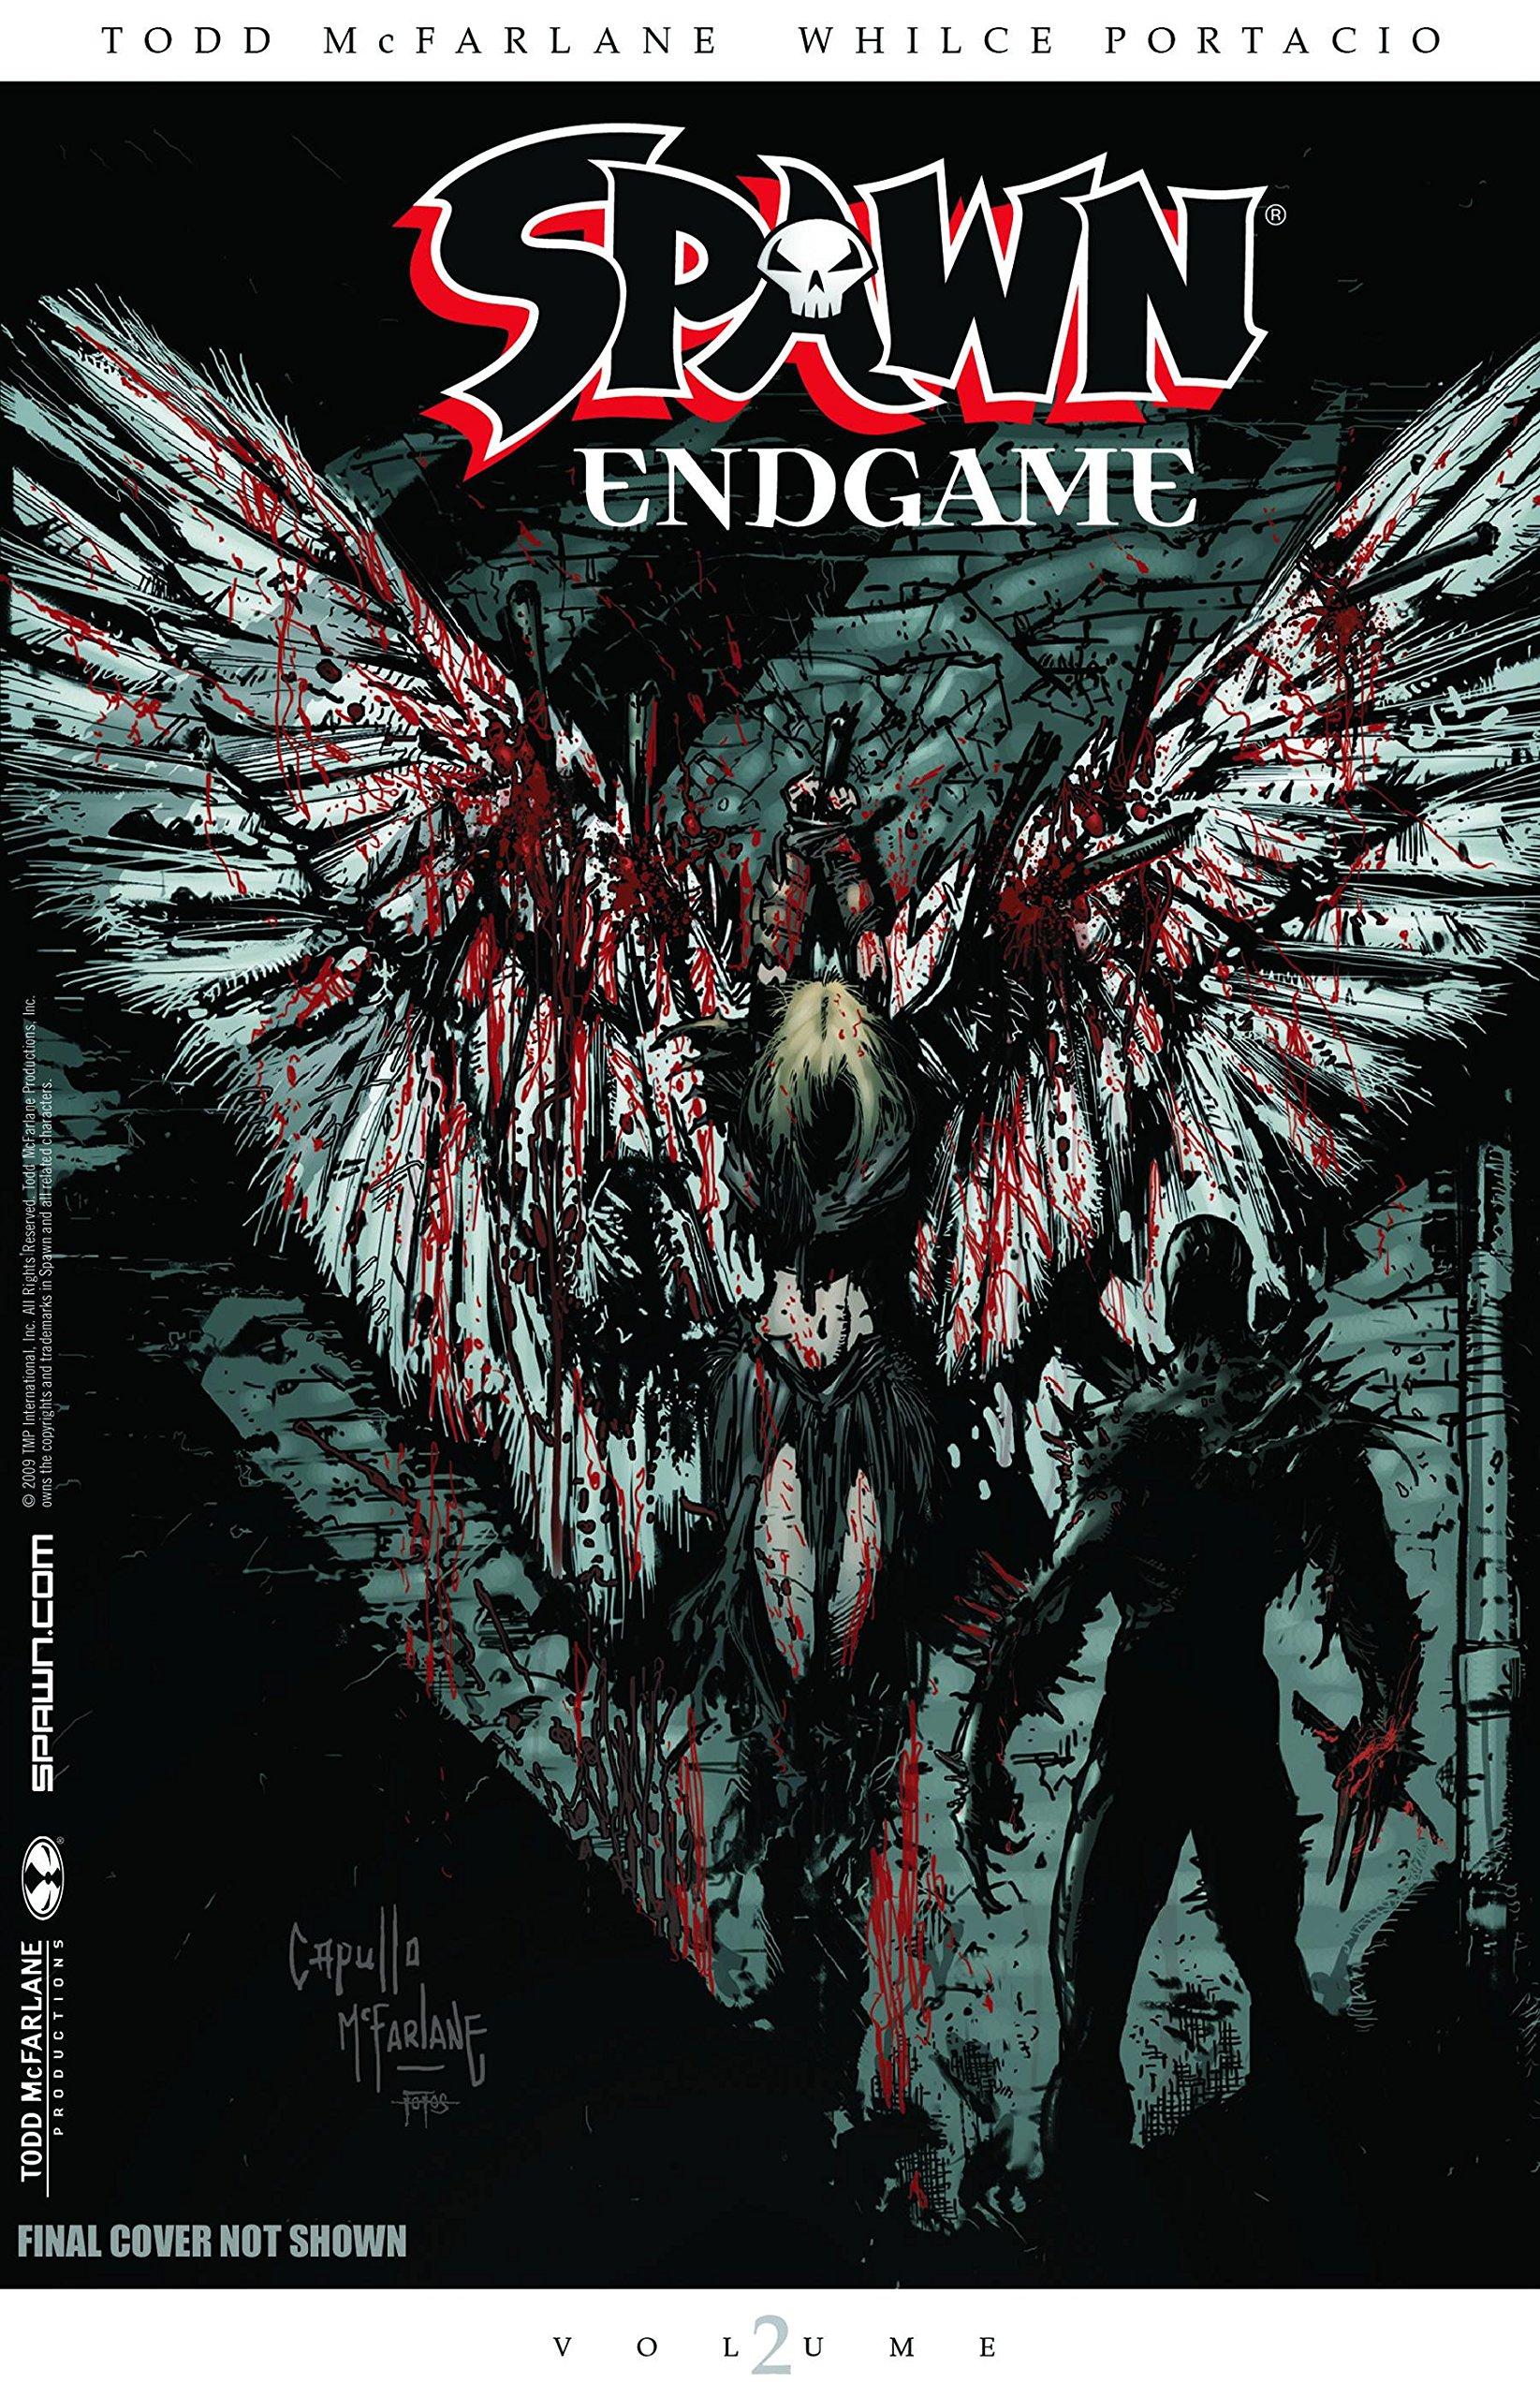 Read Online Spawn Volume 2: Endgame Part 2 PDF